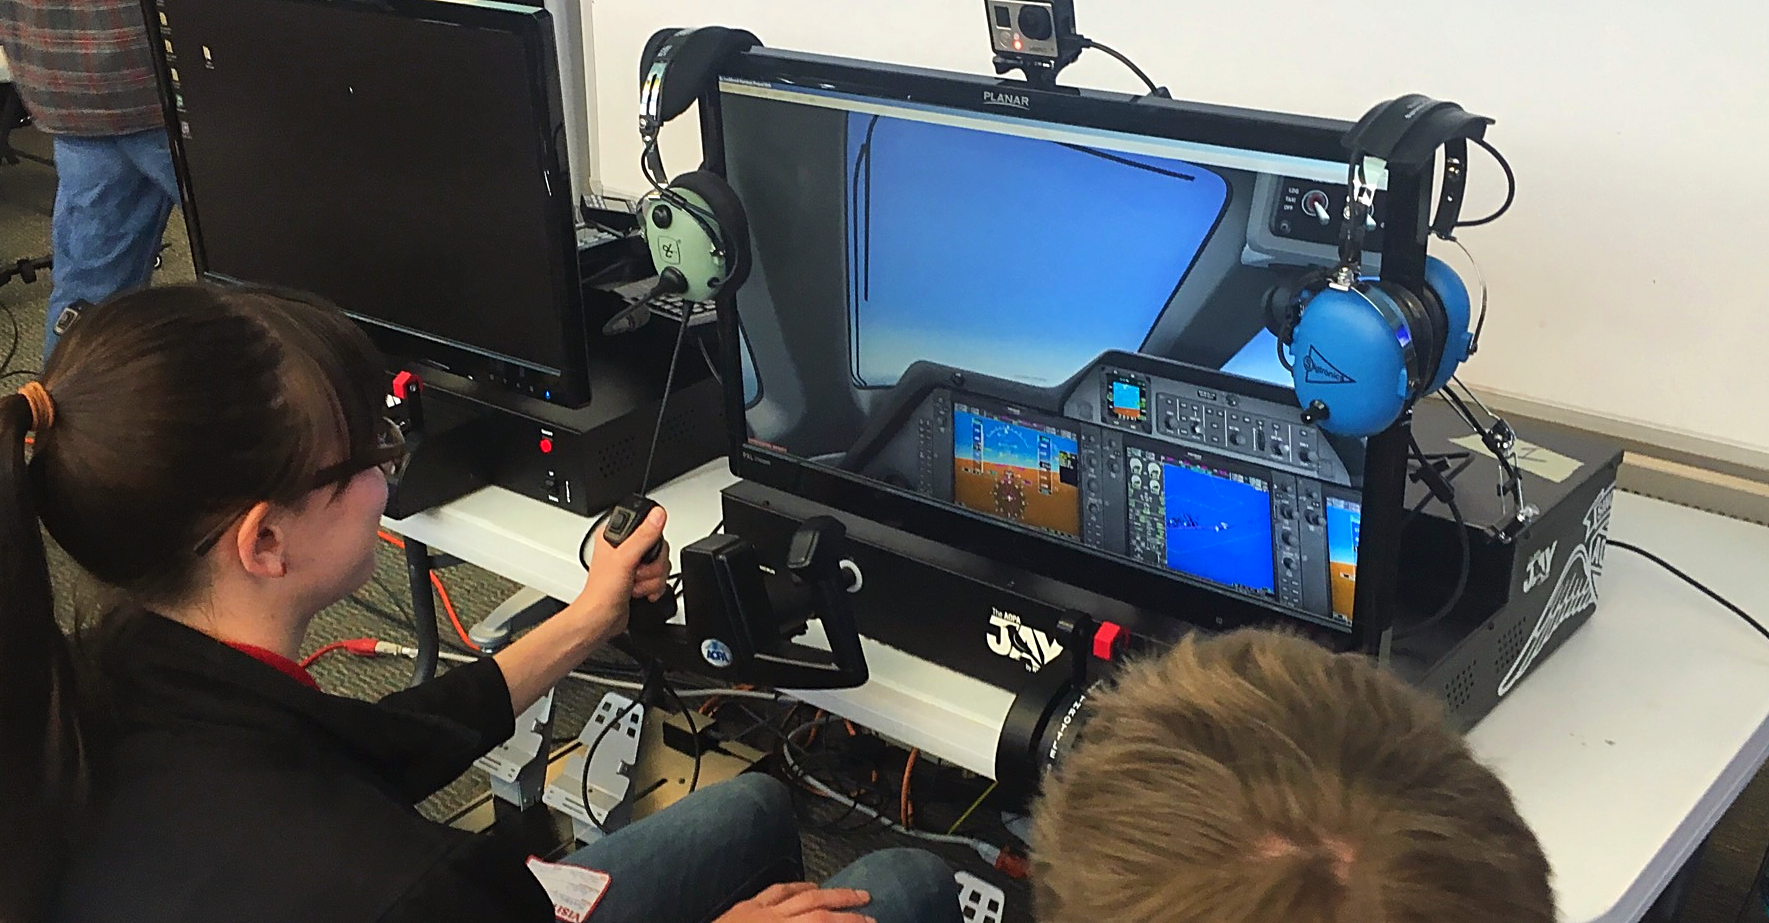 Redbird STEM Lab: The Classroom of the Future